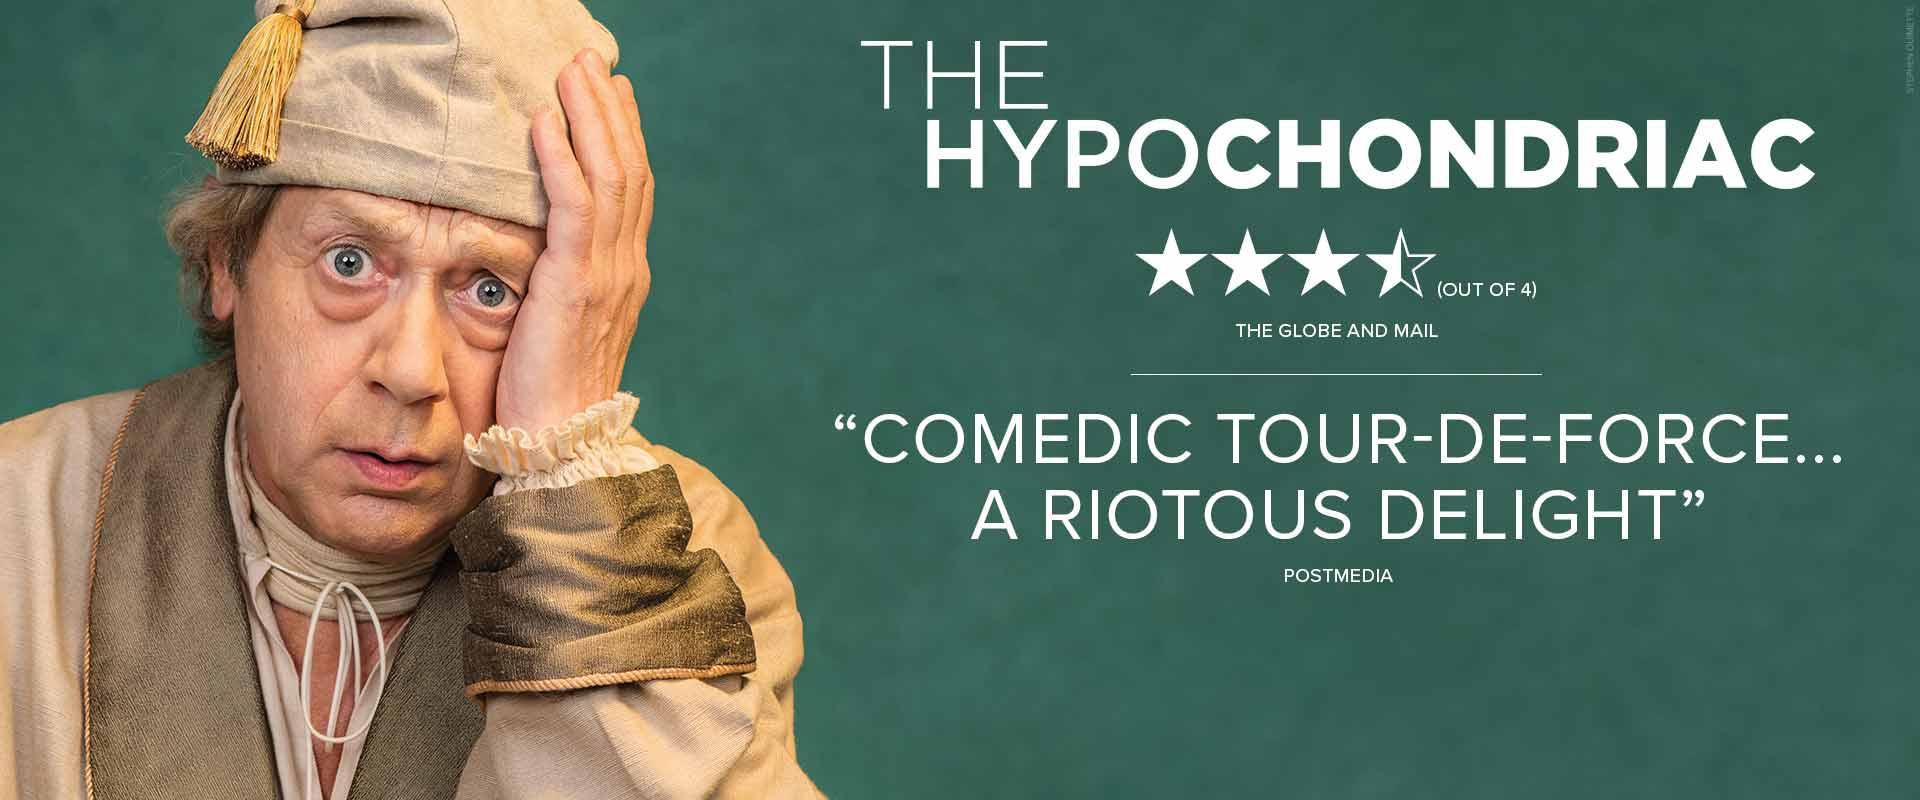 The Hypochondriac